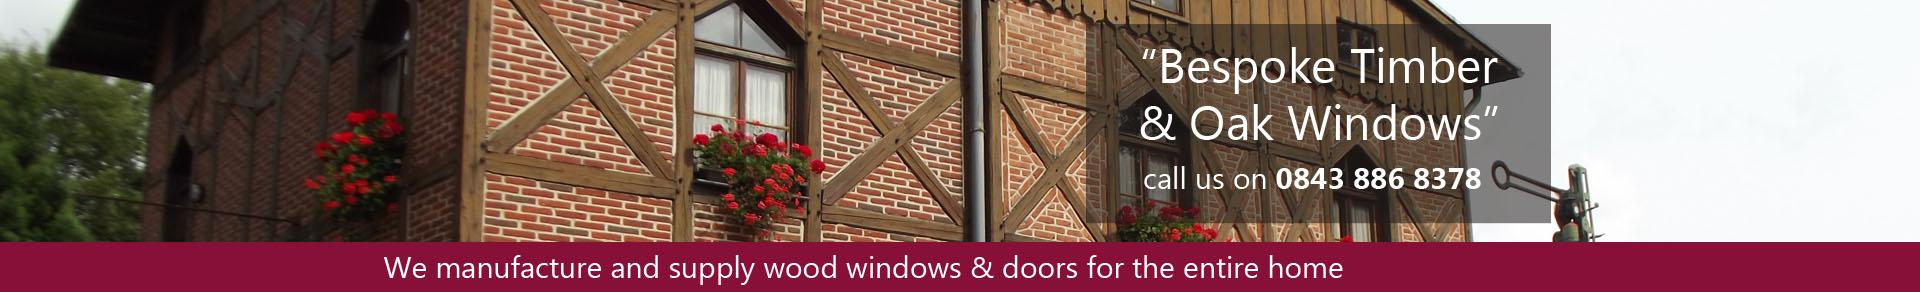 generic-windows-header2